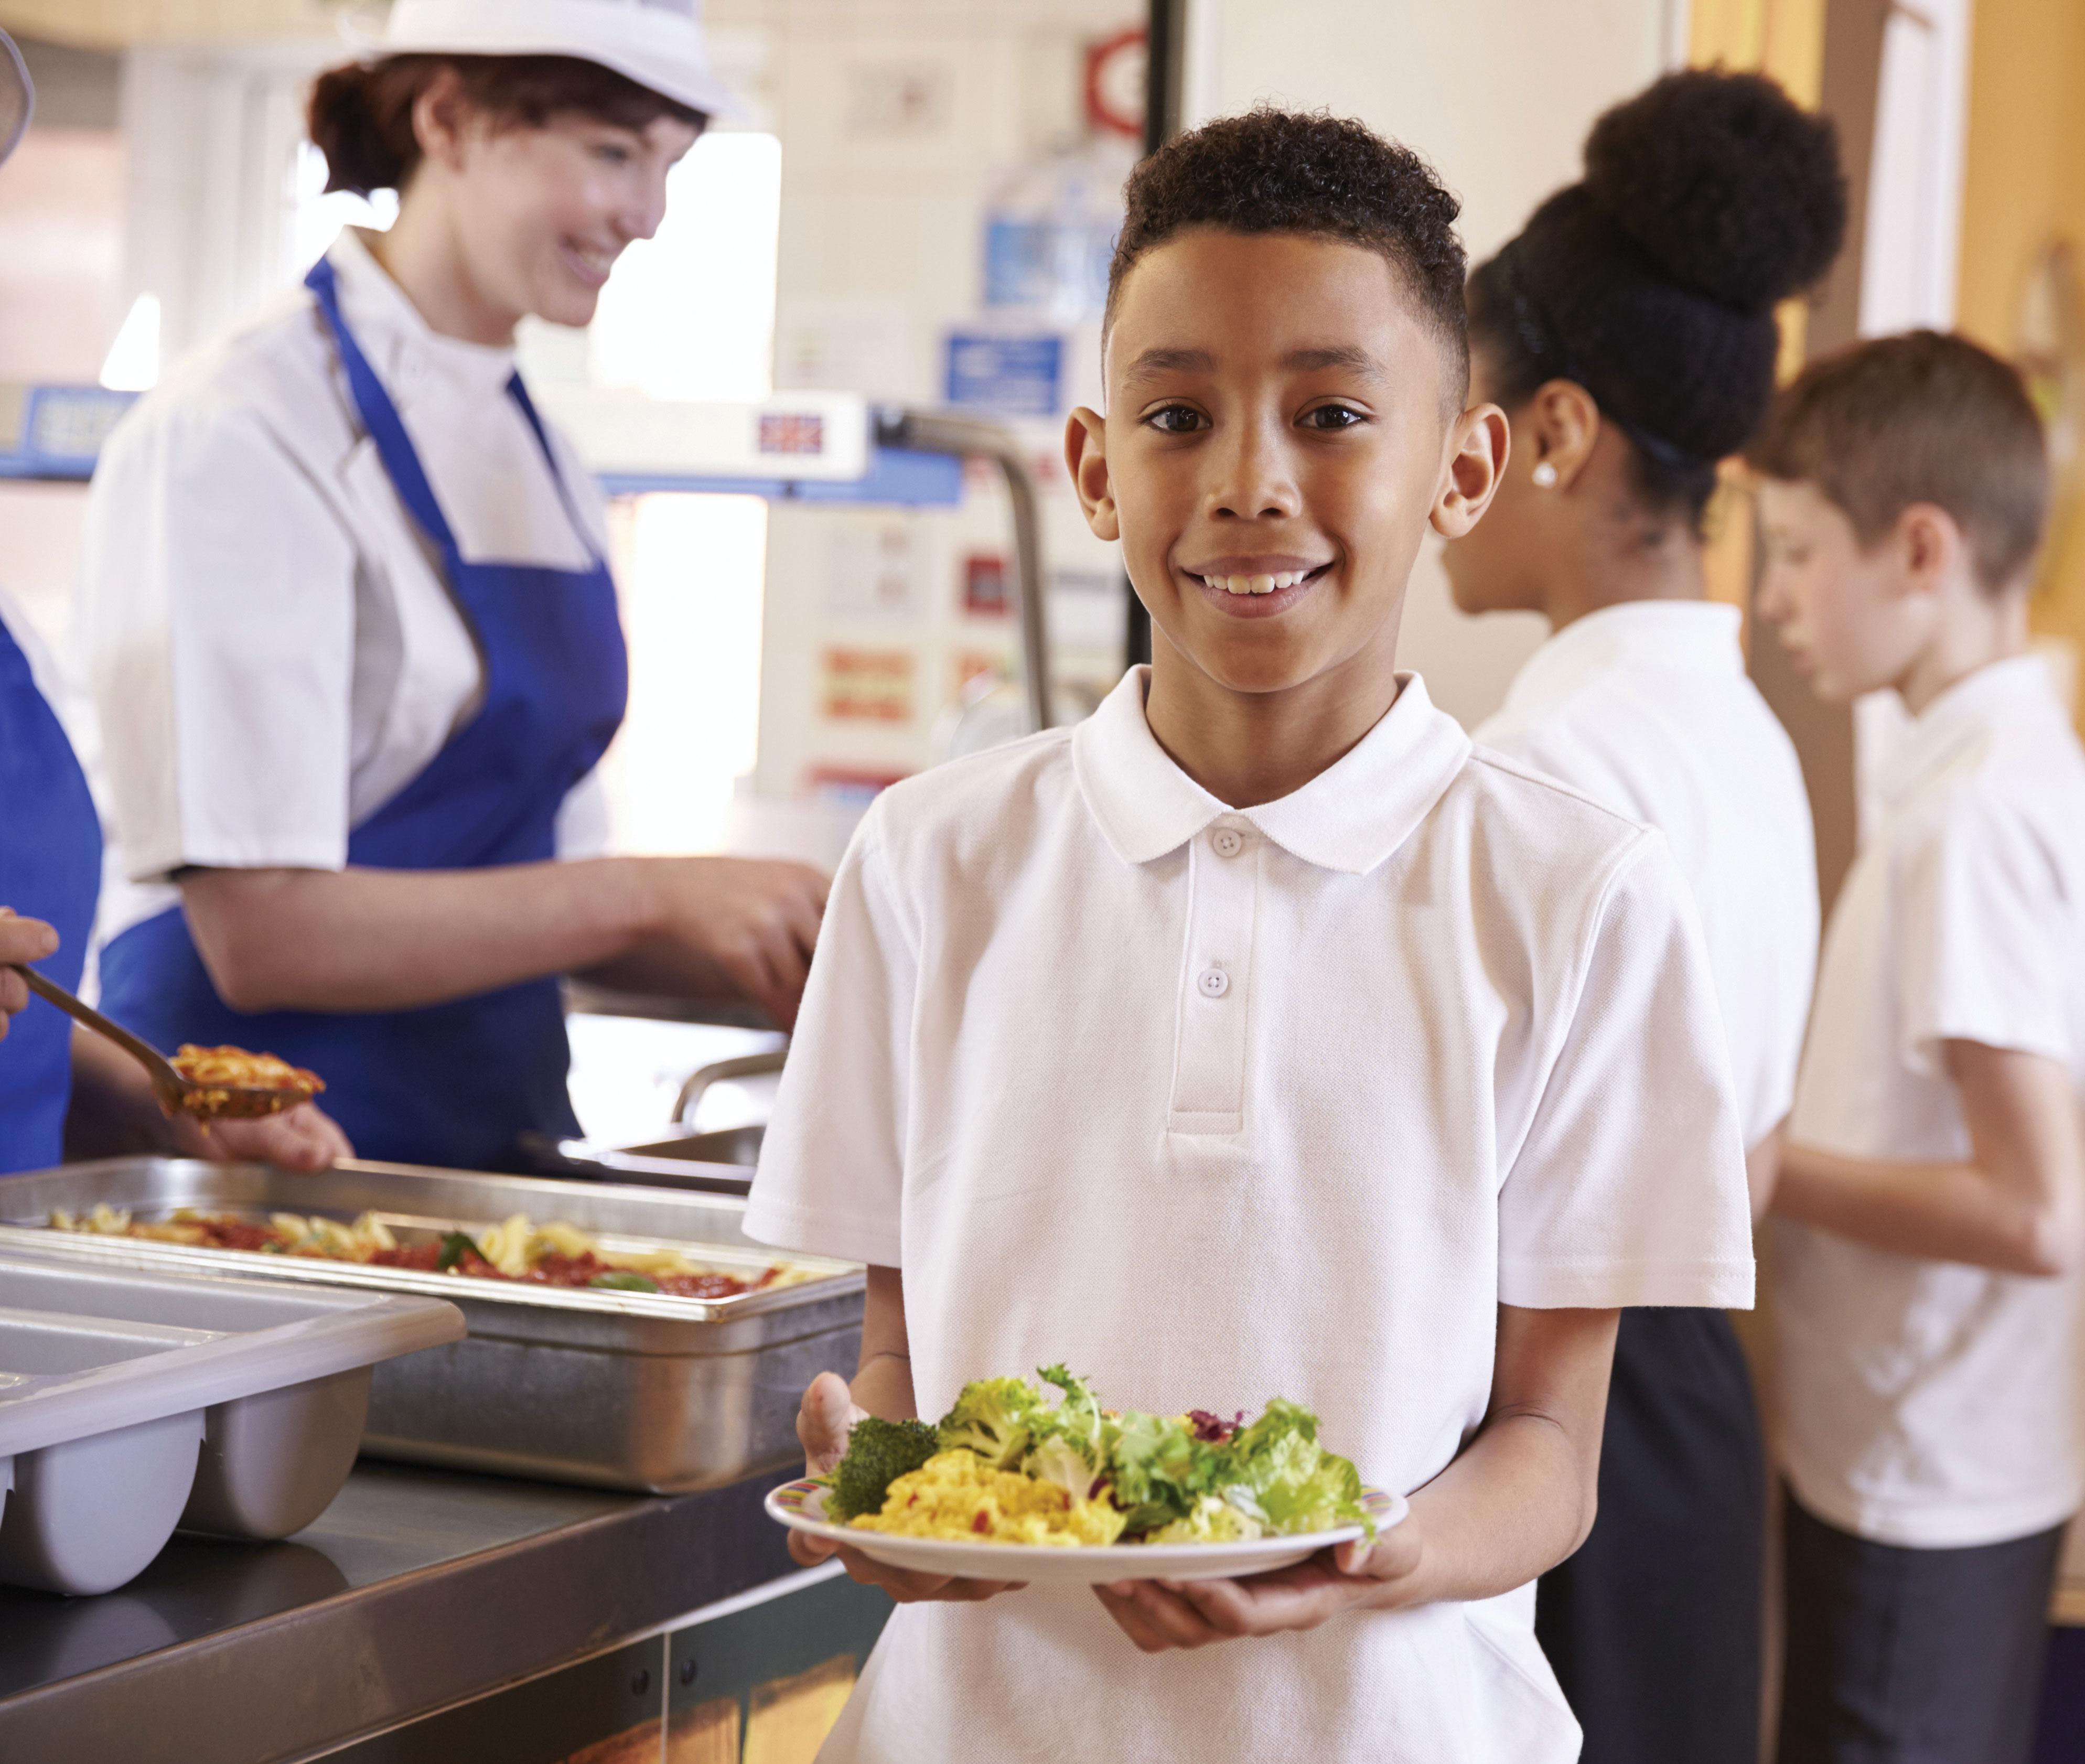 Encourage Healthy Choices Cafeteria